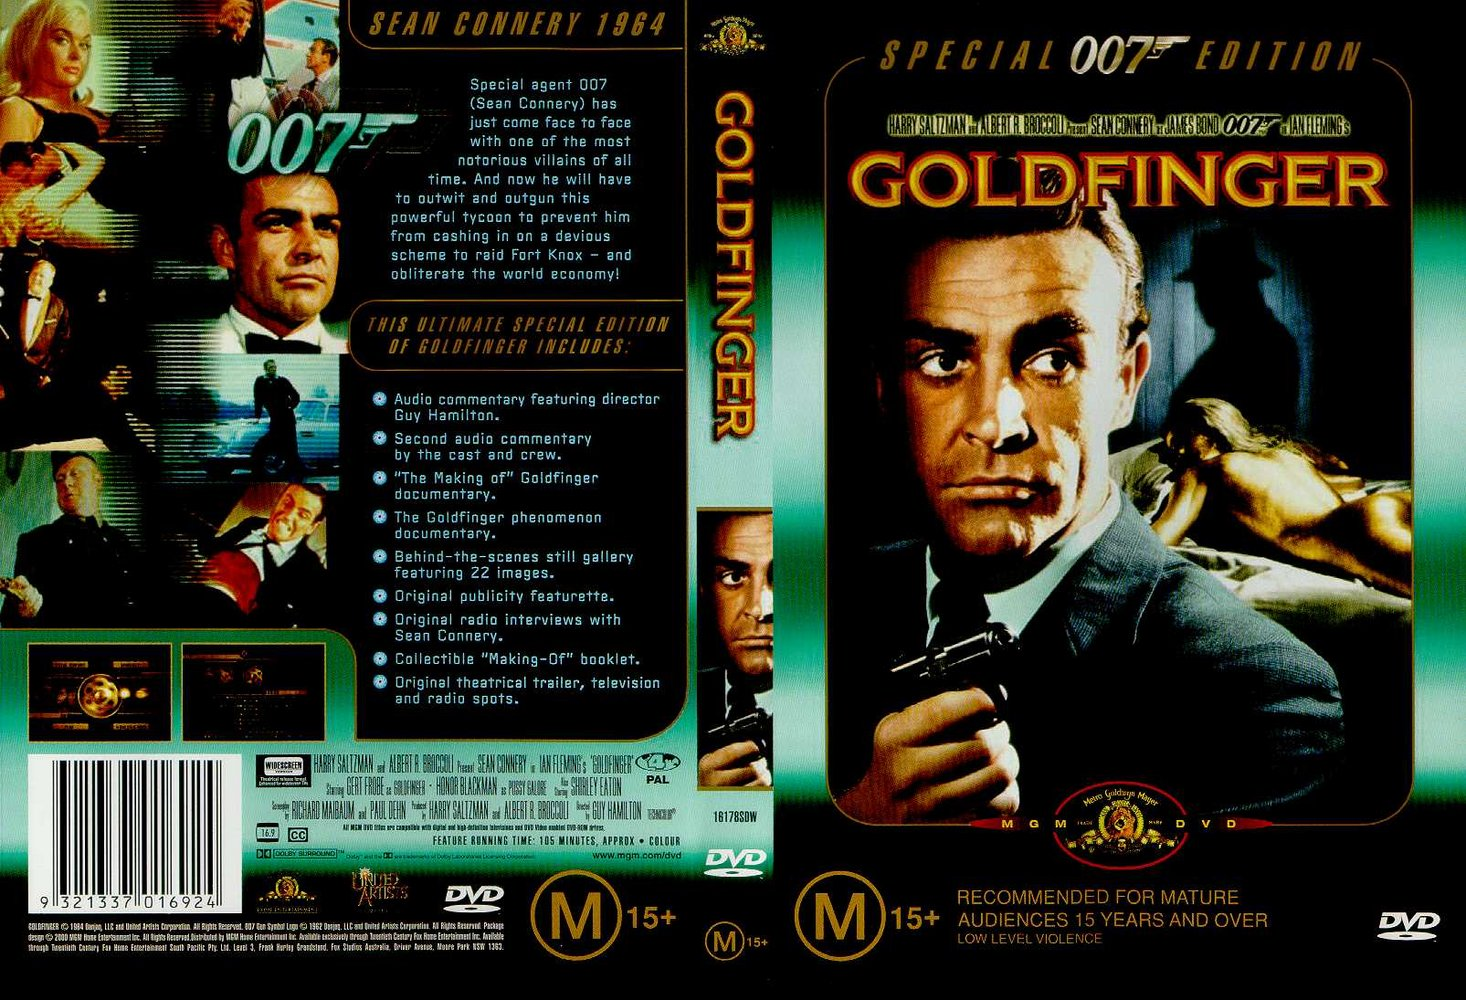 Goldfinger cast